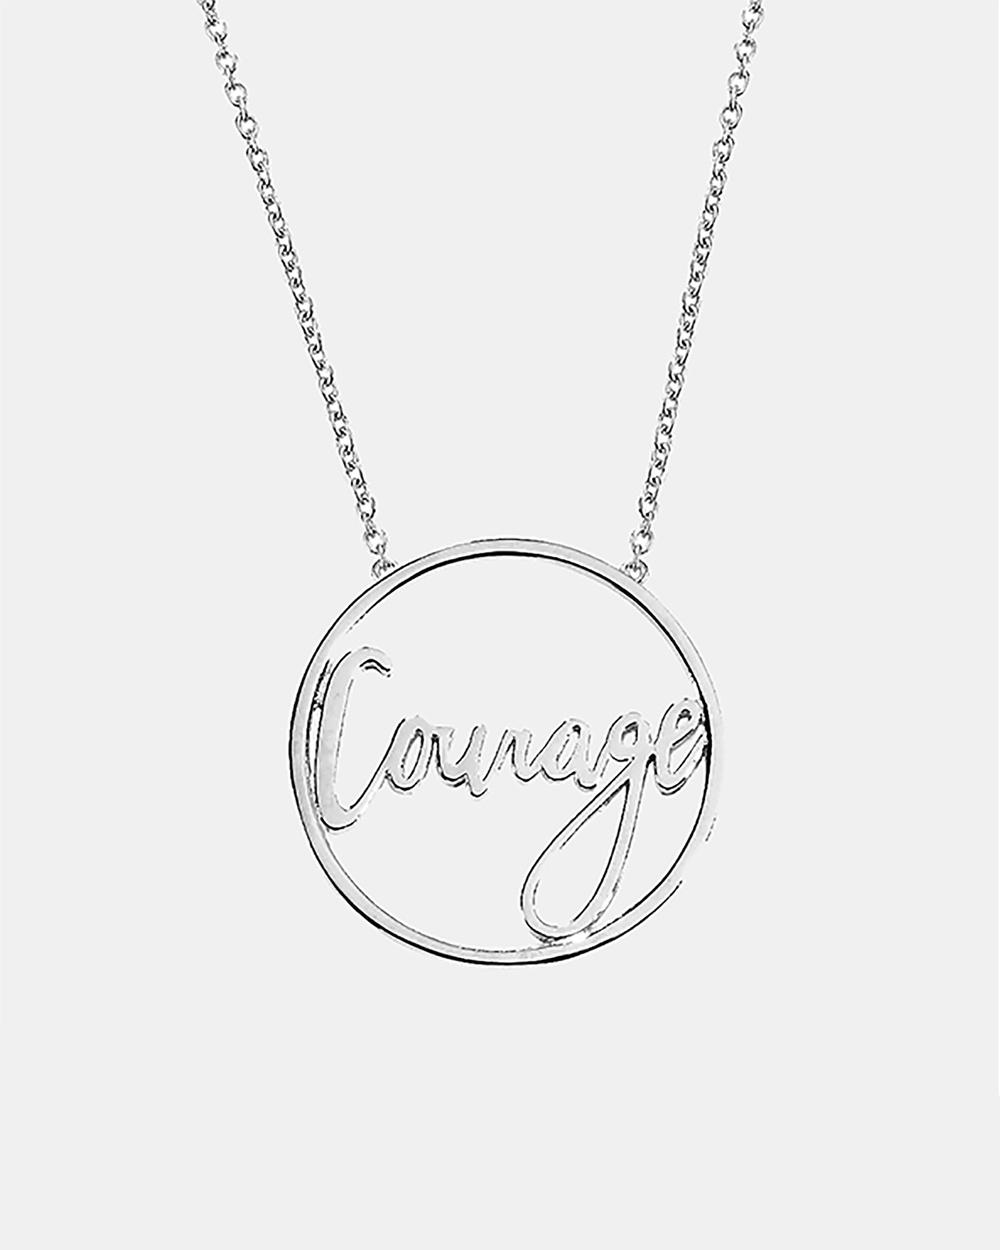 Secret Sisterhood Courage Necklace Jewellery Silver